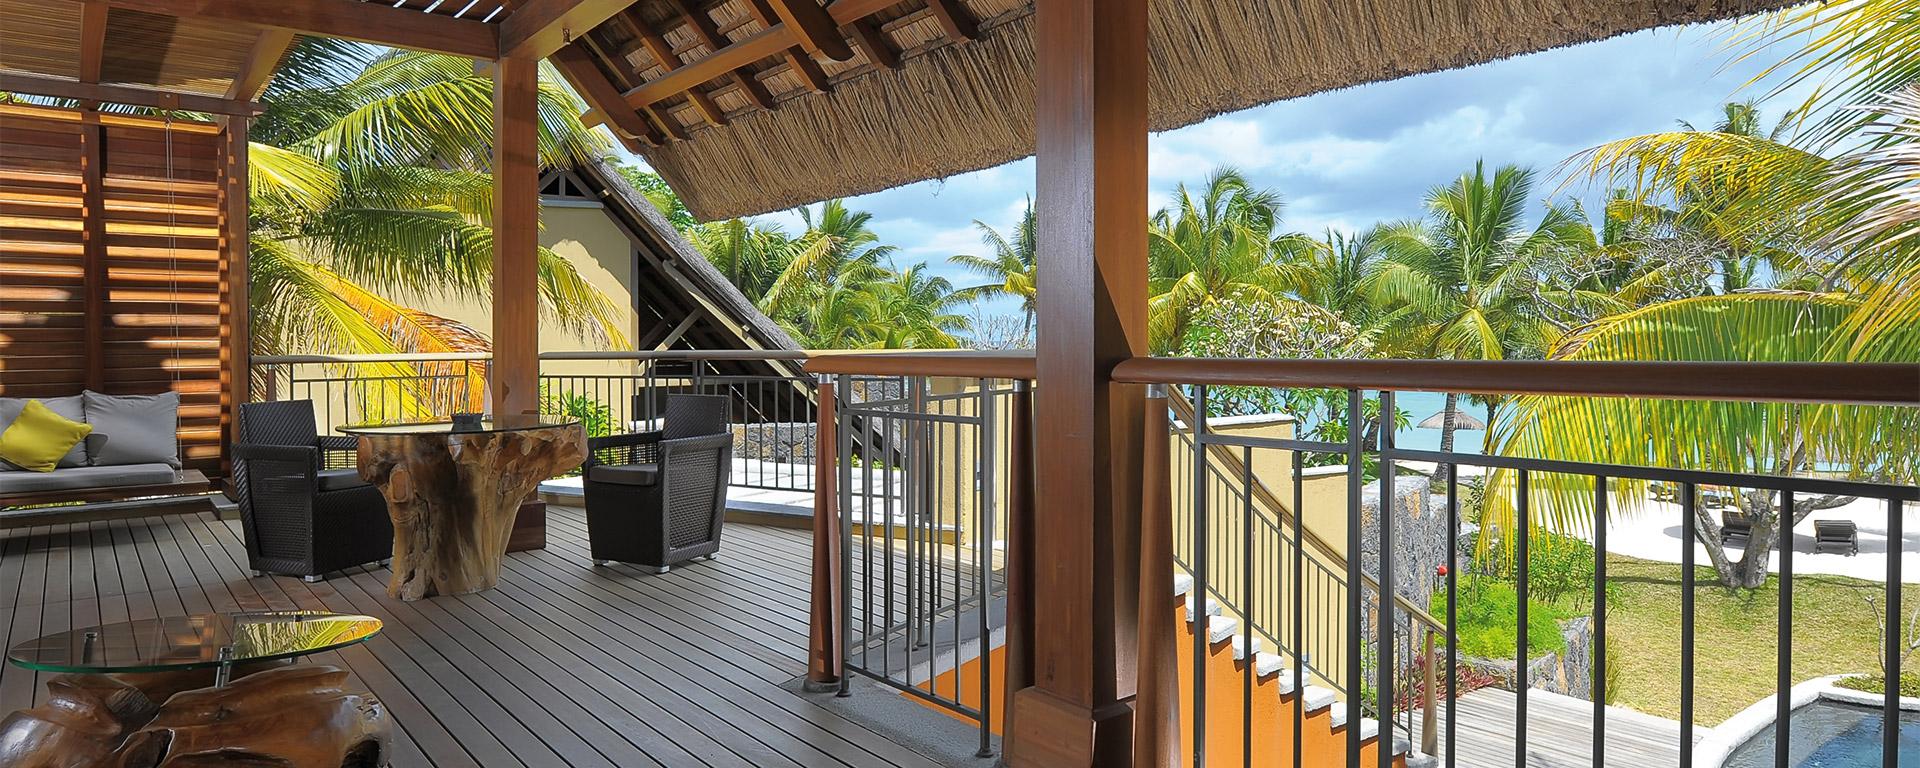 Beachfront Senior Suite with pool